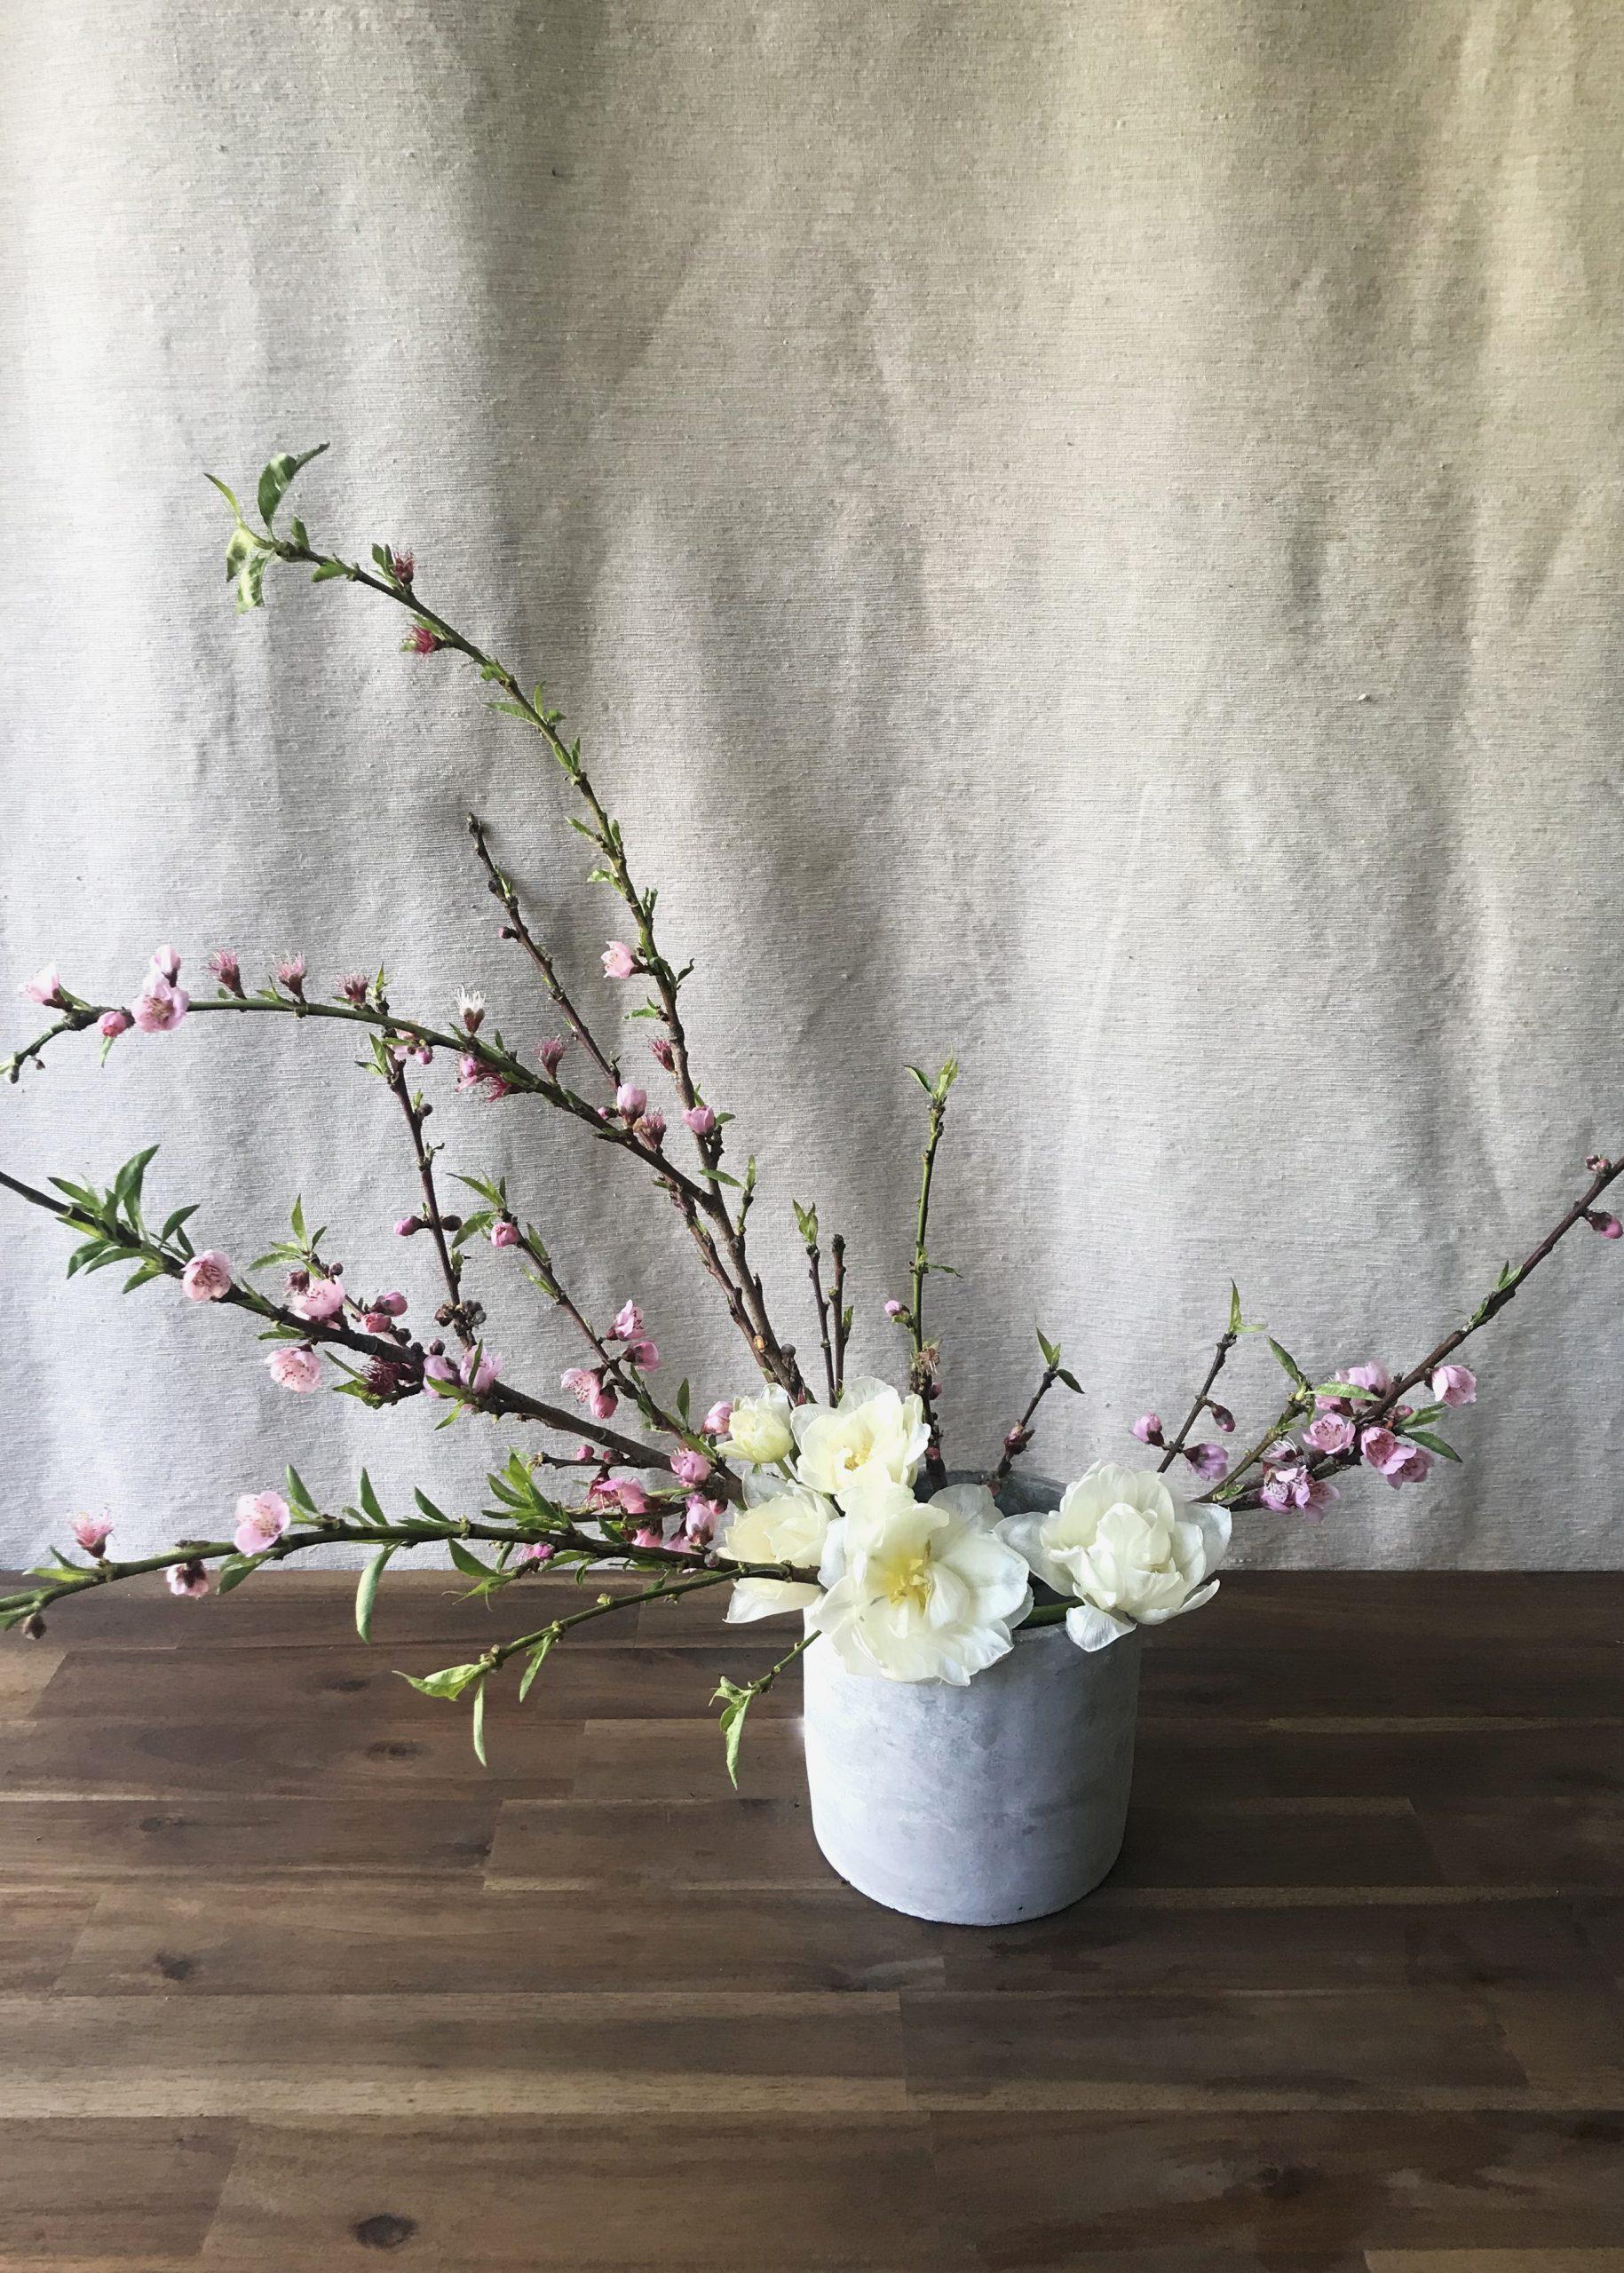 7 Tips to help tulips last longer